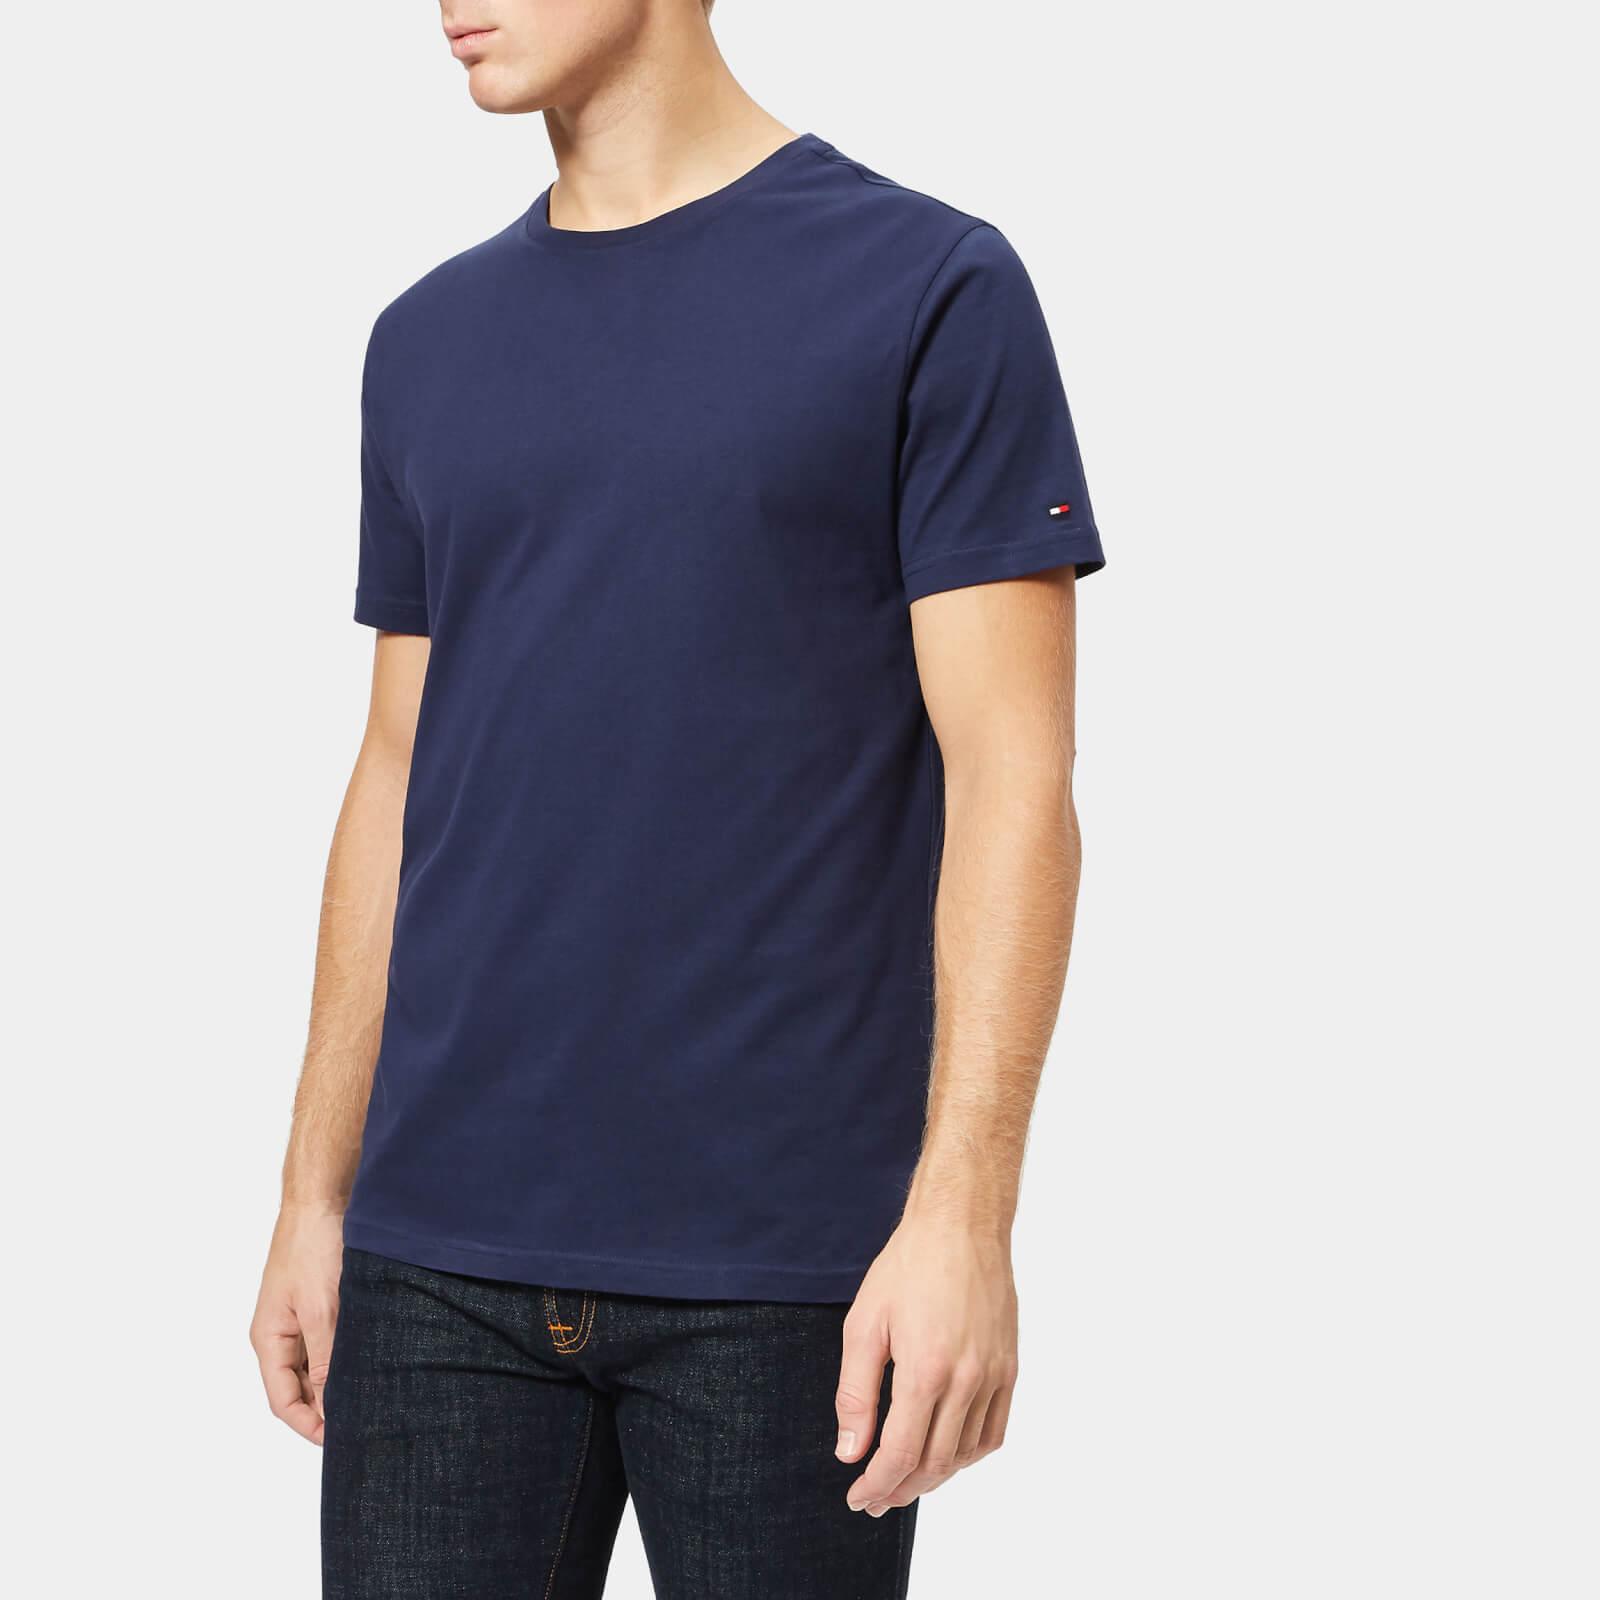 92b8d6b90 Tommy Hilfiger Men's 2 Pack Short Sleeve Crew Neck T-Shirt - Navy Clothing  | TheHut.com